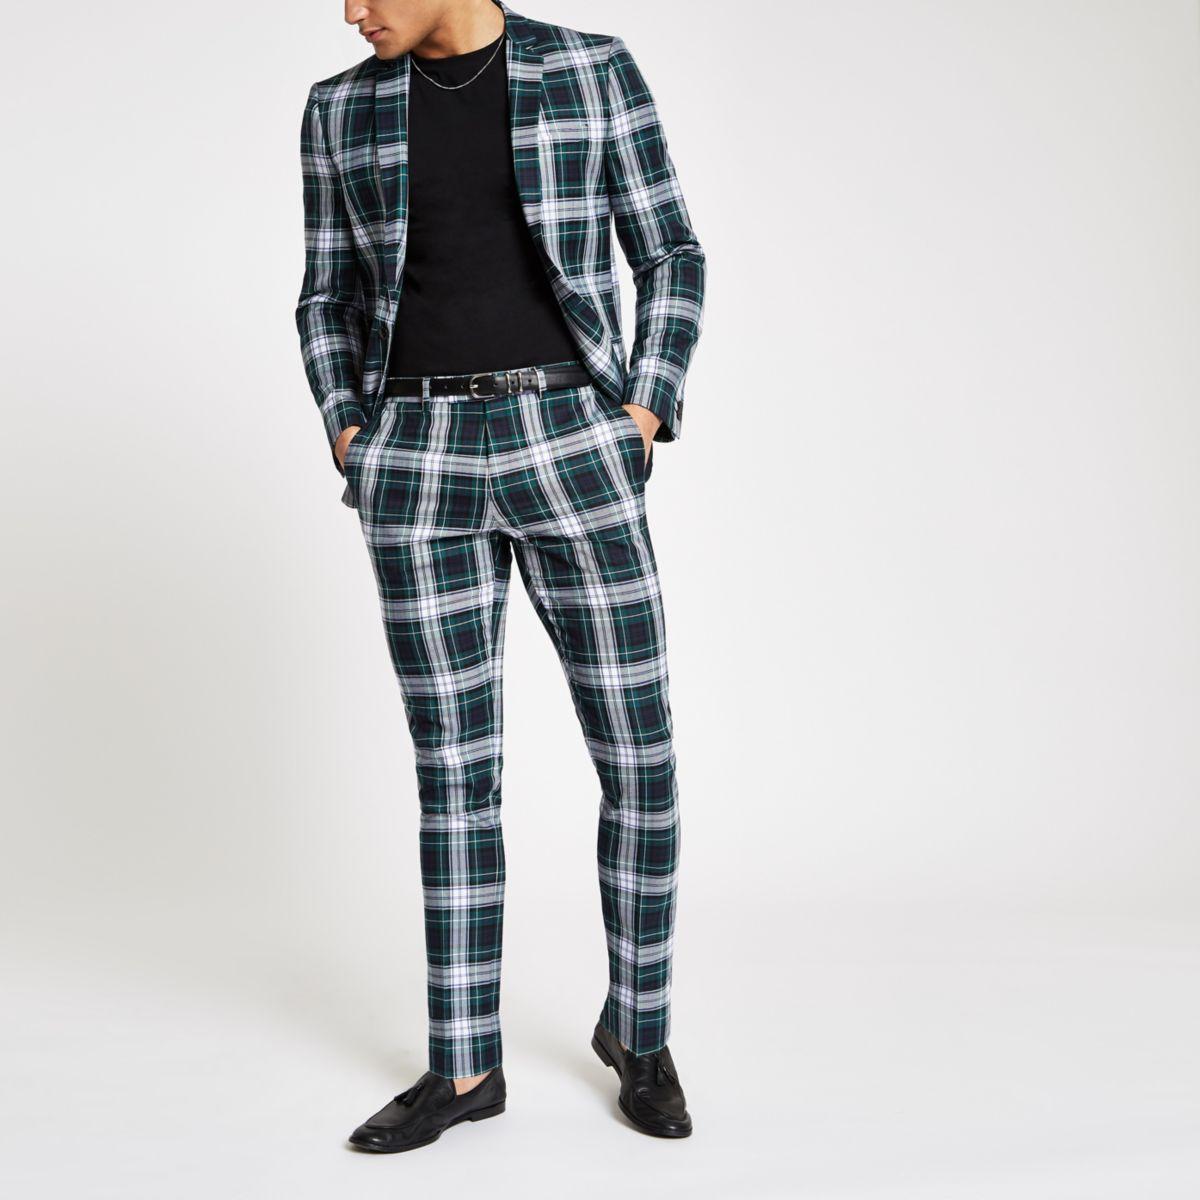 Green tartan skinny fit suit trousers